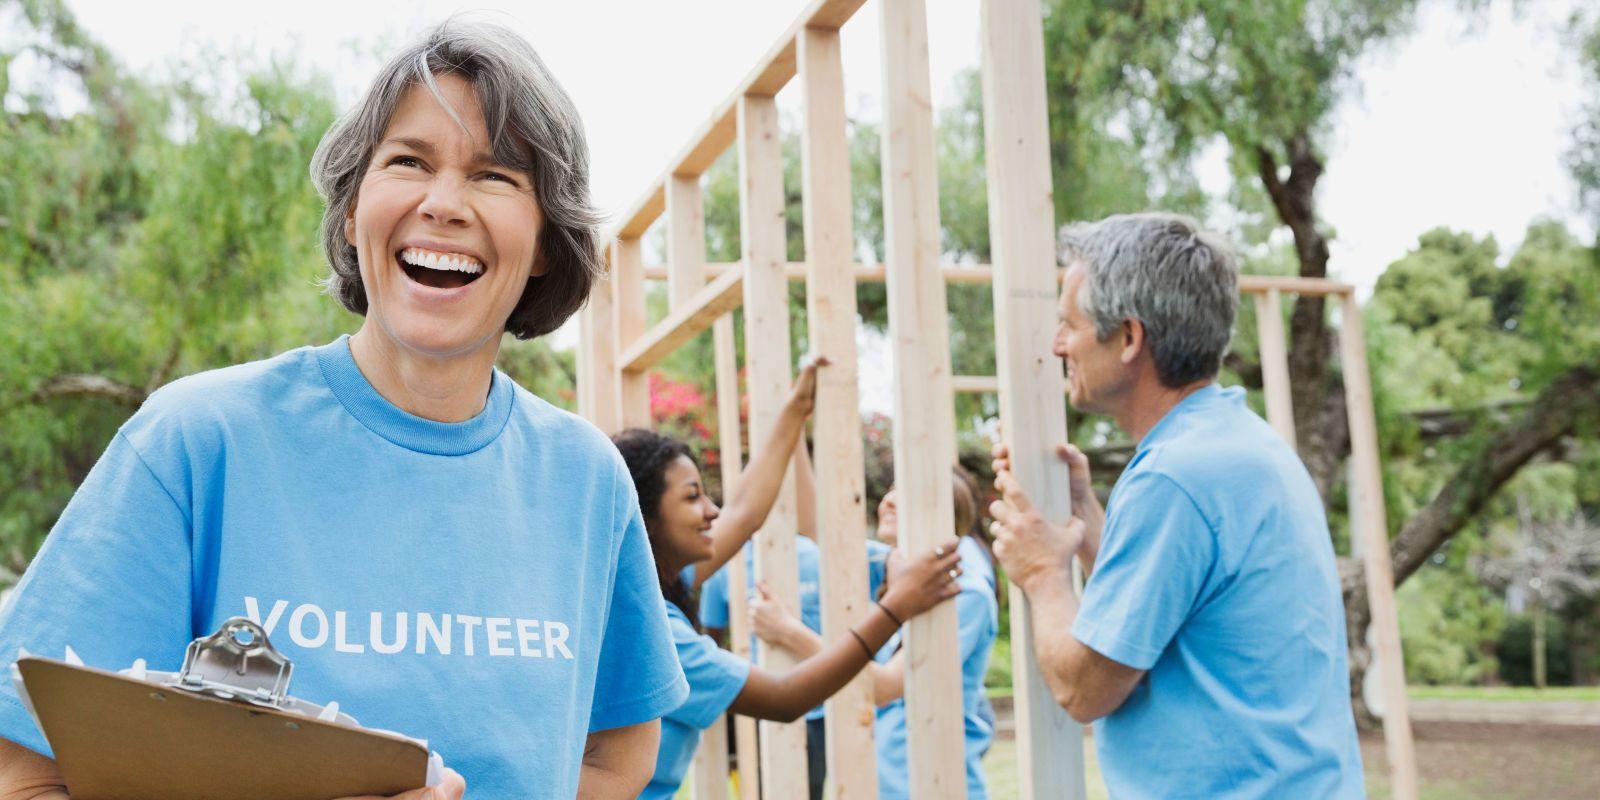 Does being kind really make us happy? Volunteer, Program